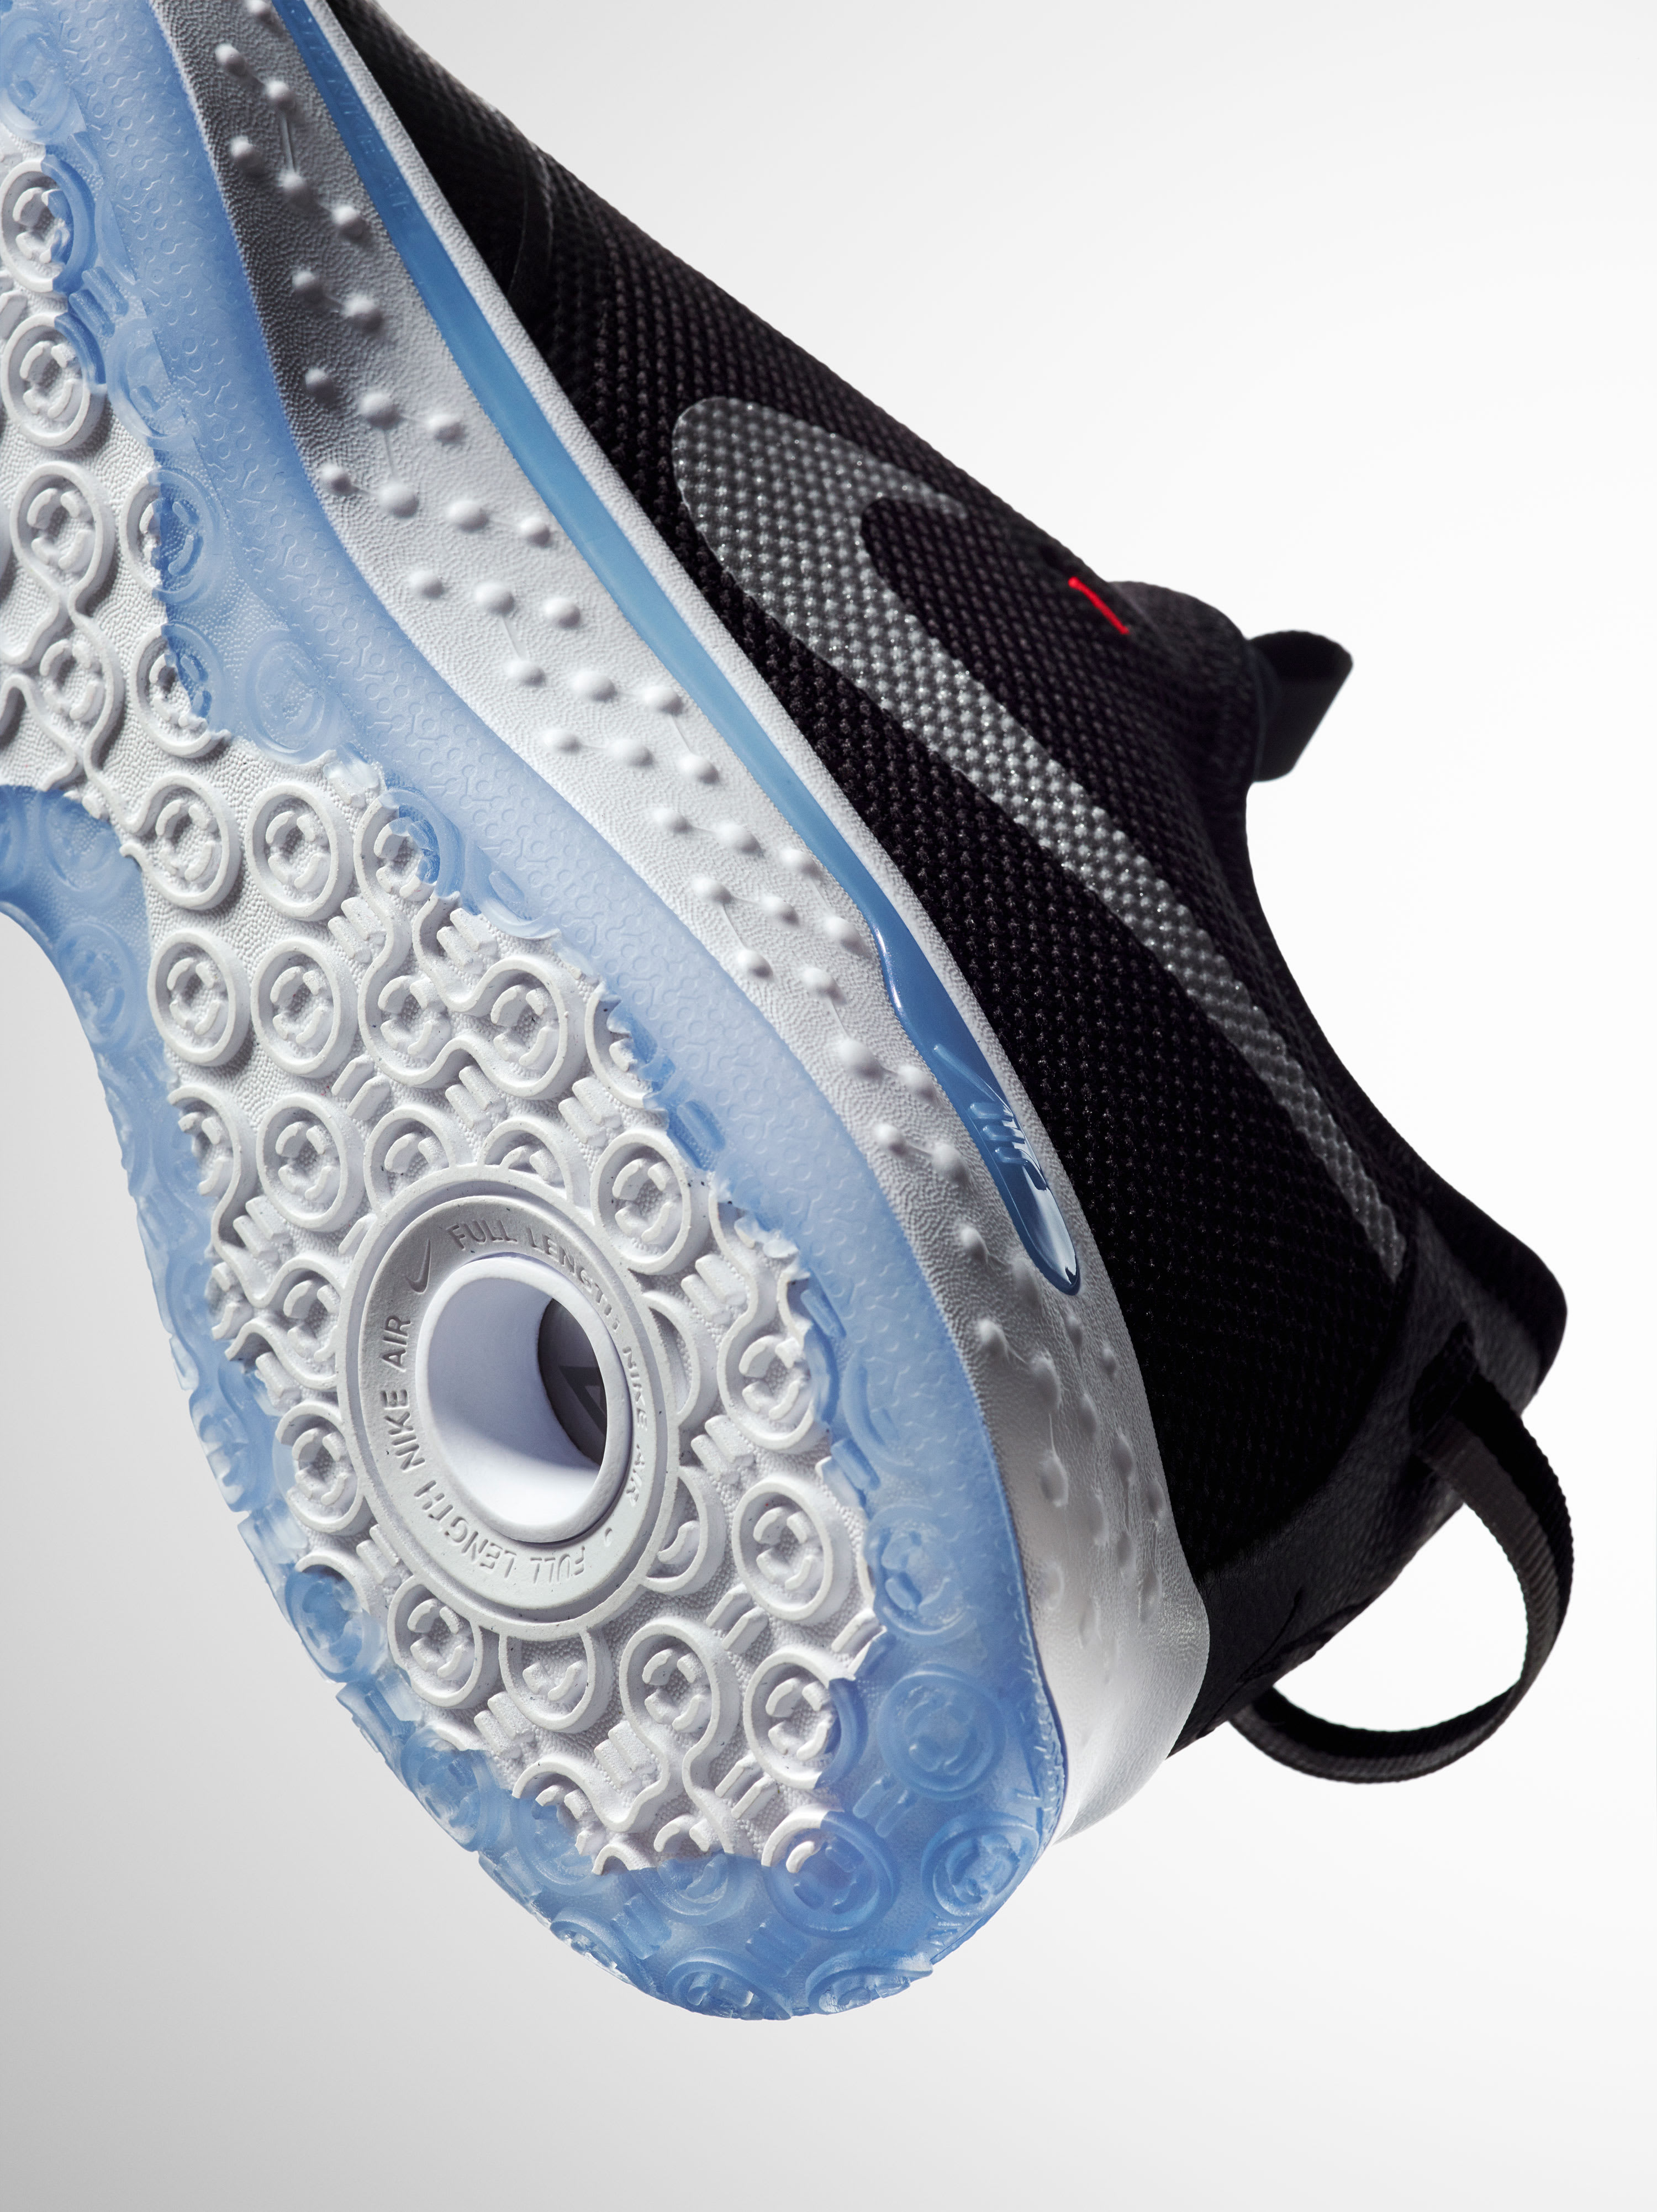 Nike PG 4 Black White Release Date CD5082-001 Sole